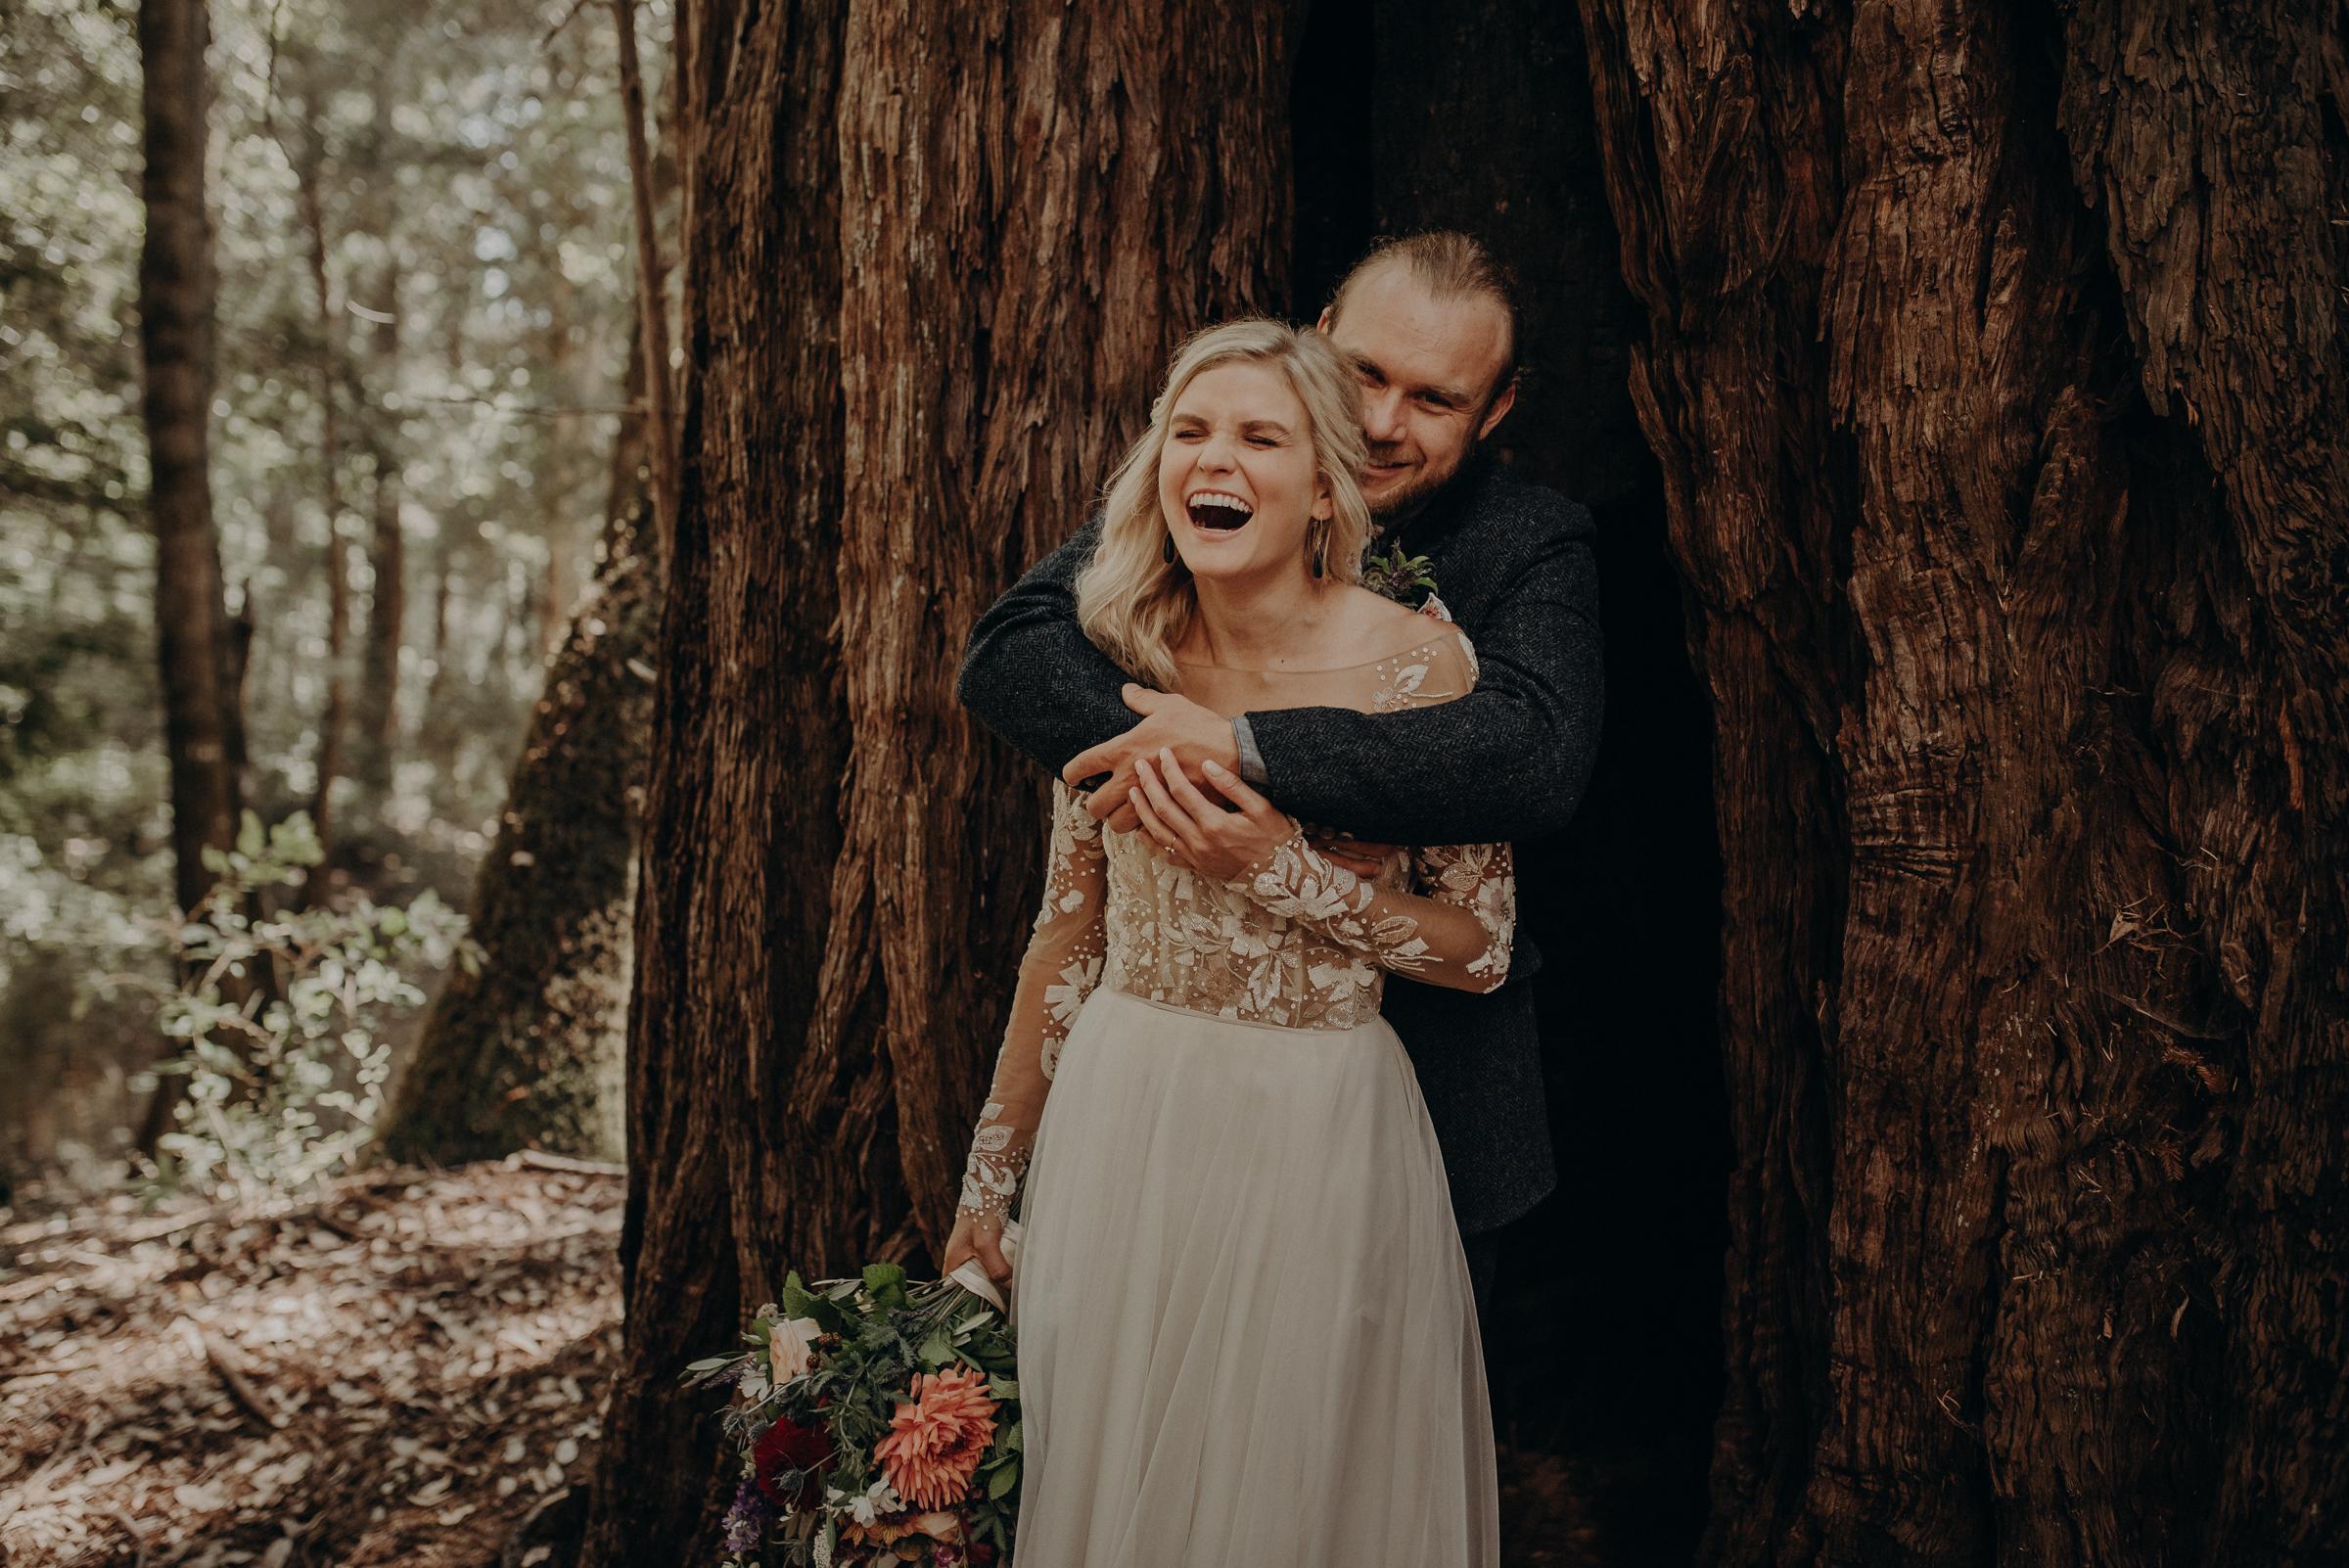 IsaiahAndTaylor.com - California Destination Elopement, Lake Leonard Reserve Wedding, Ukiah-062.jpg